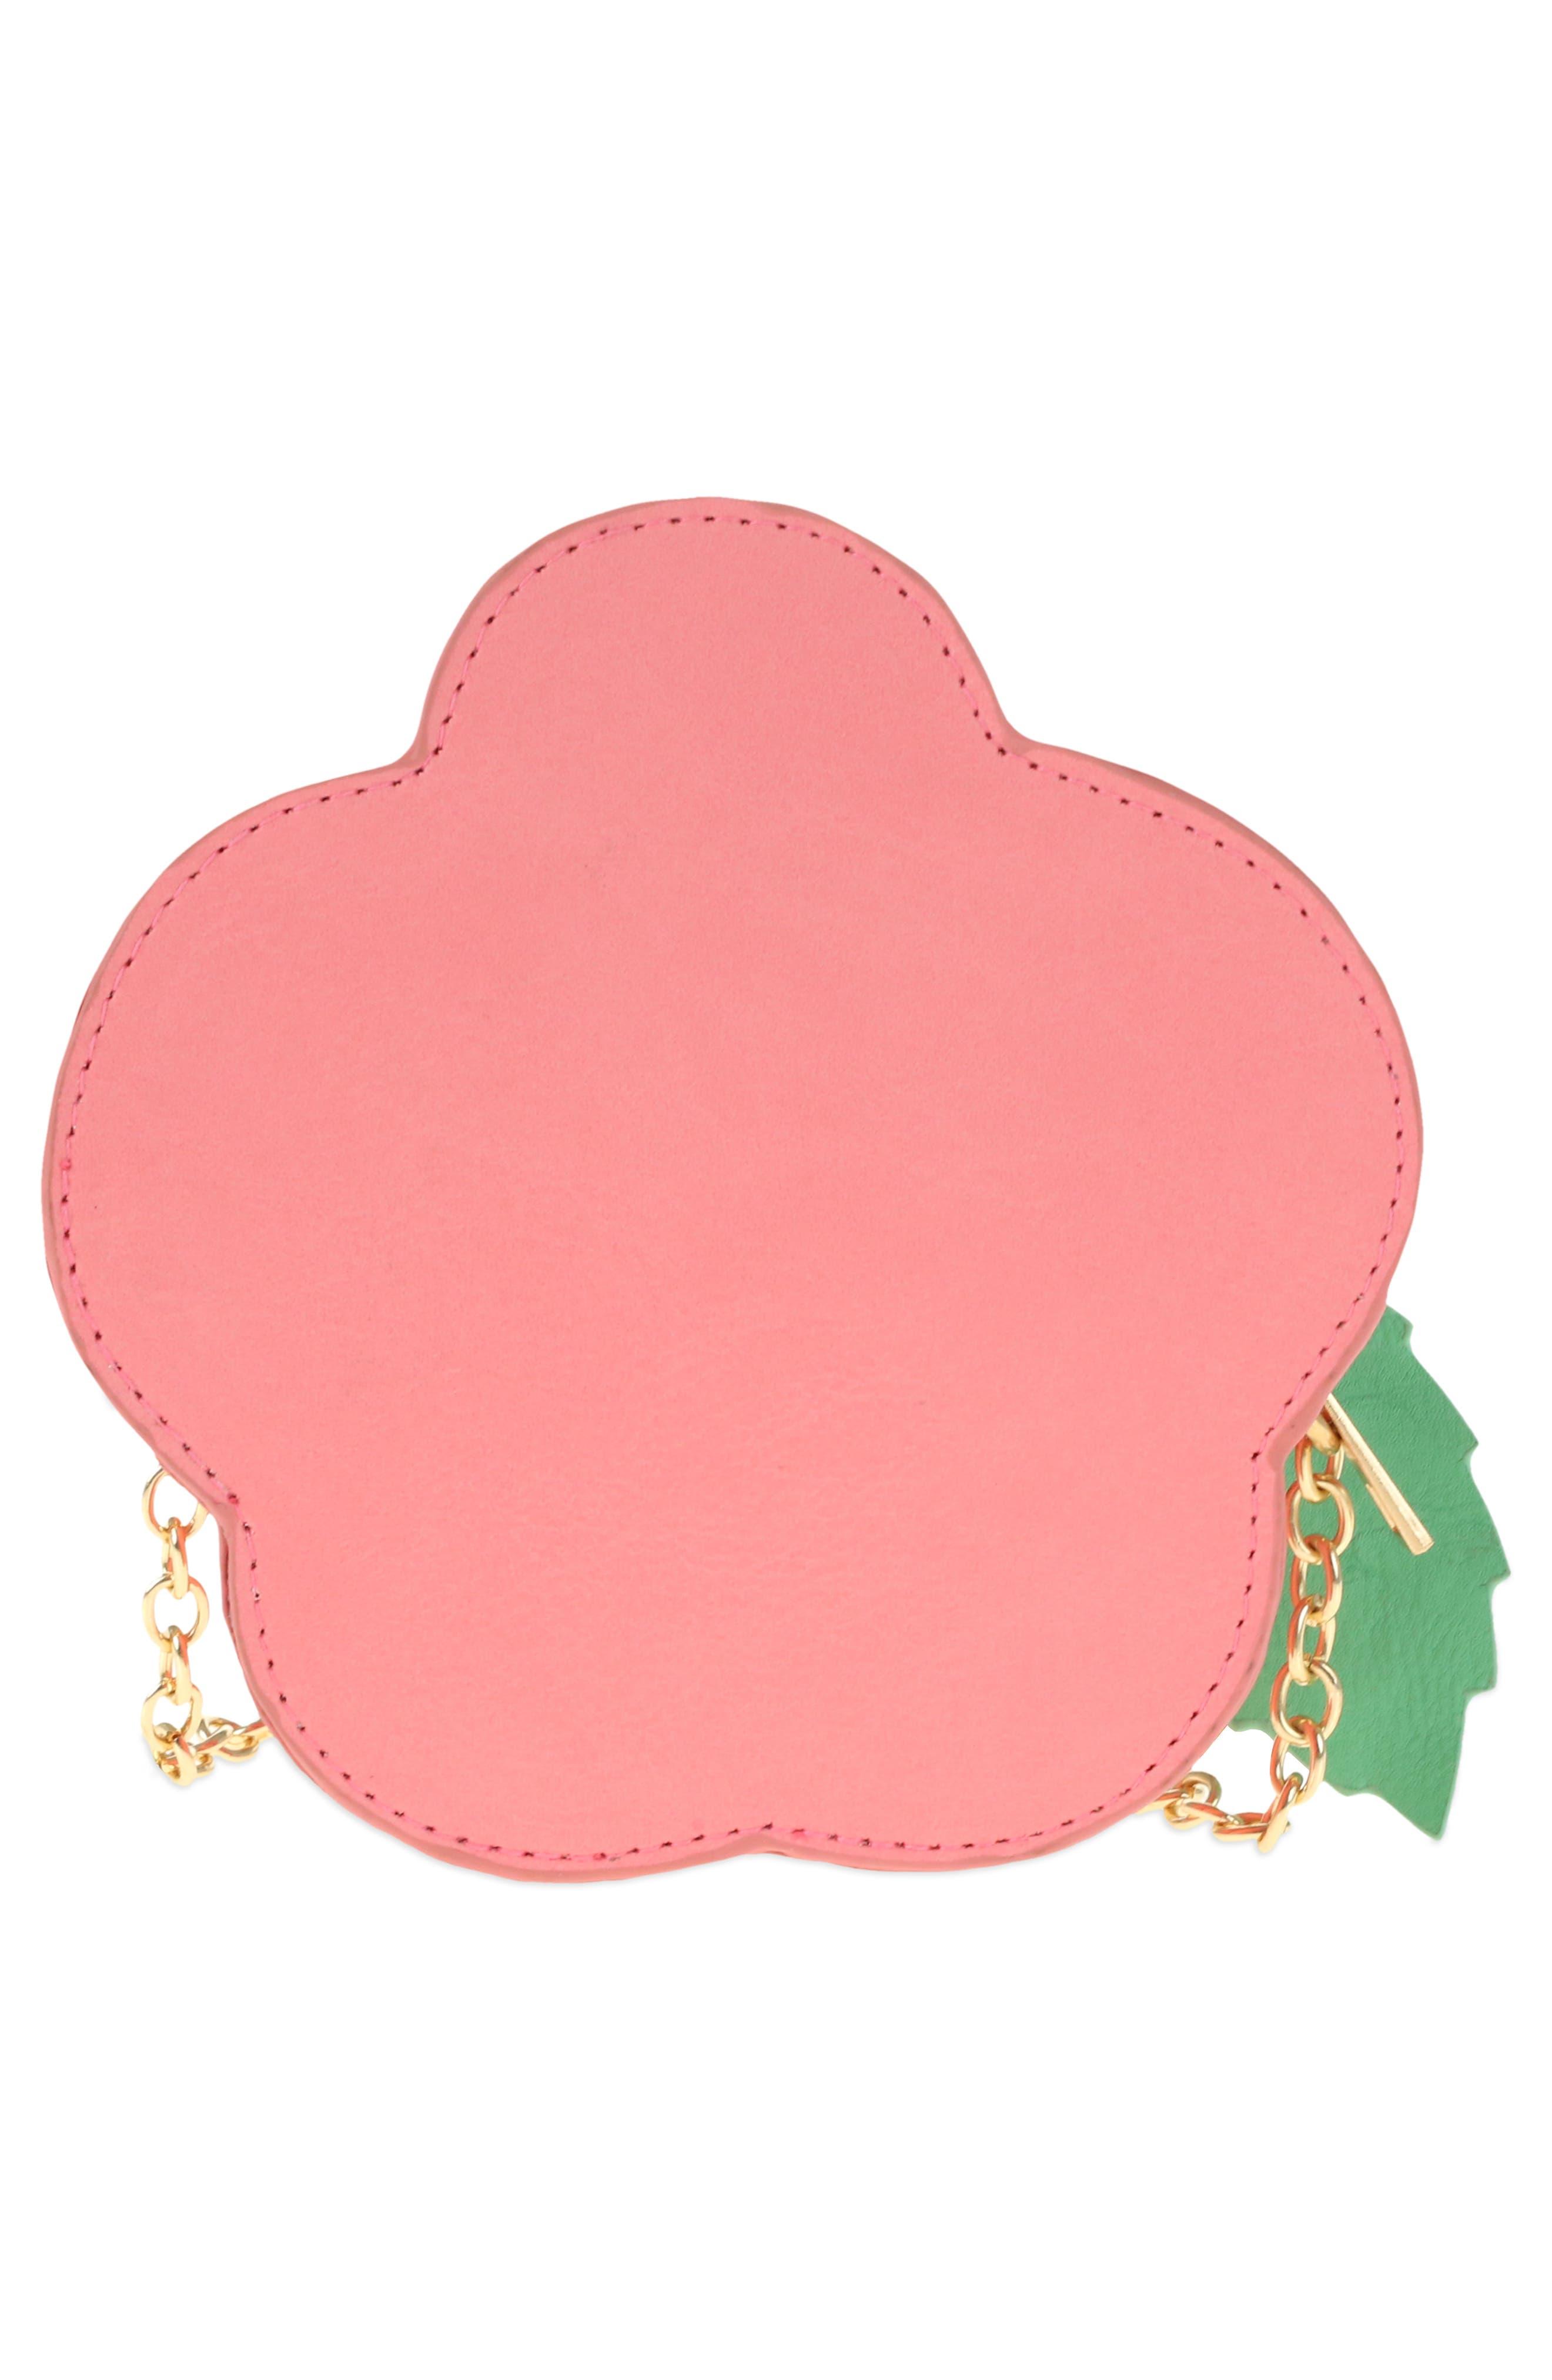 Rose Crossbody Bag,                             Alternate thumbnail 2, color,                             602